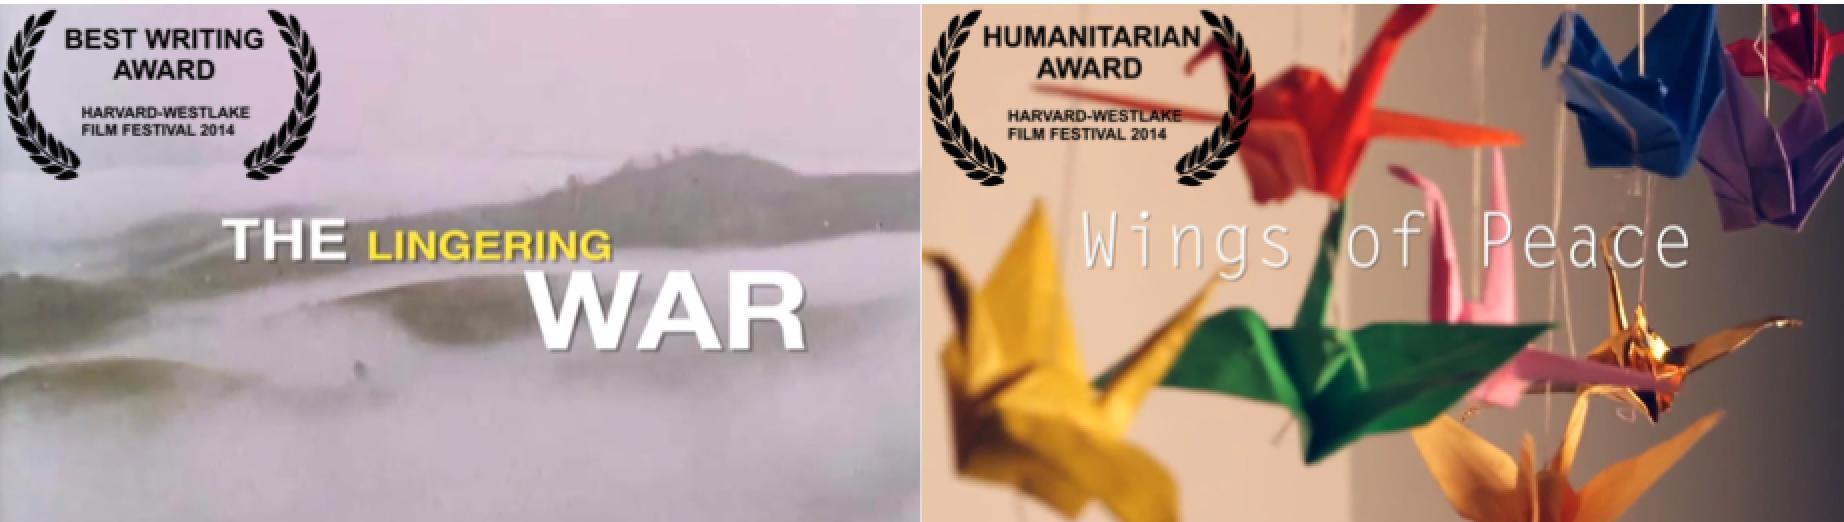 Documentaries Accepted into Harvard Westlake Film Festival